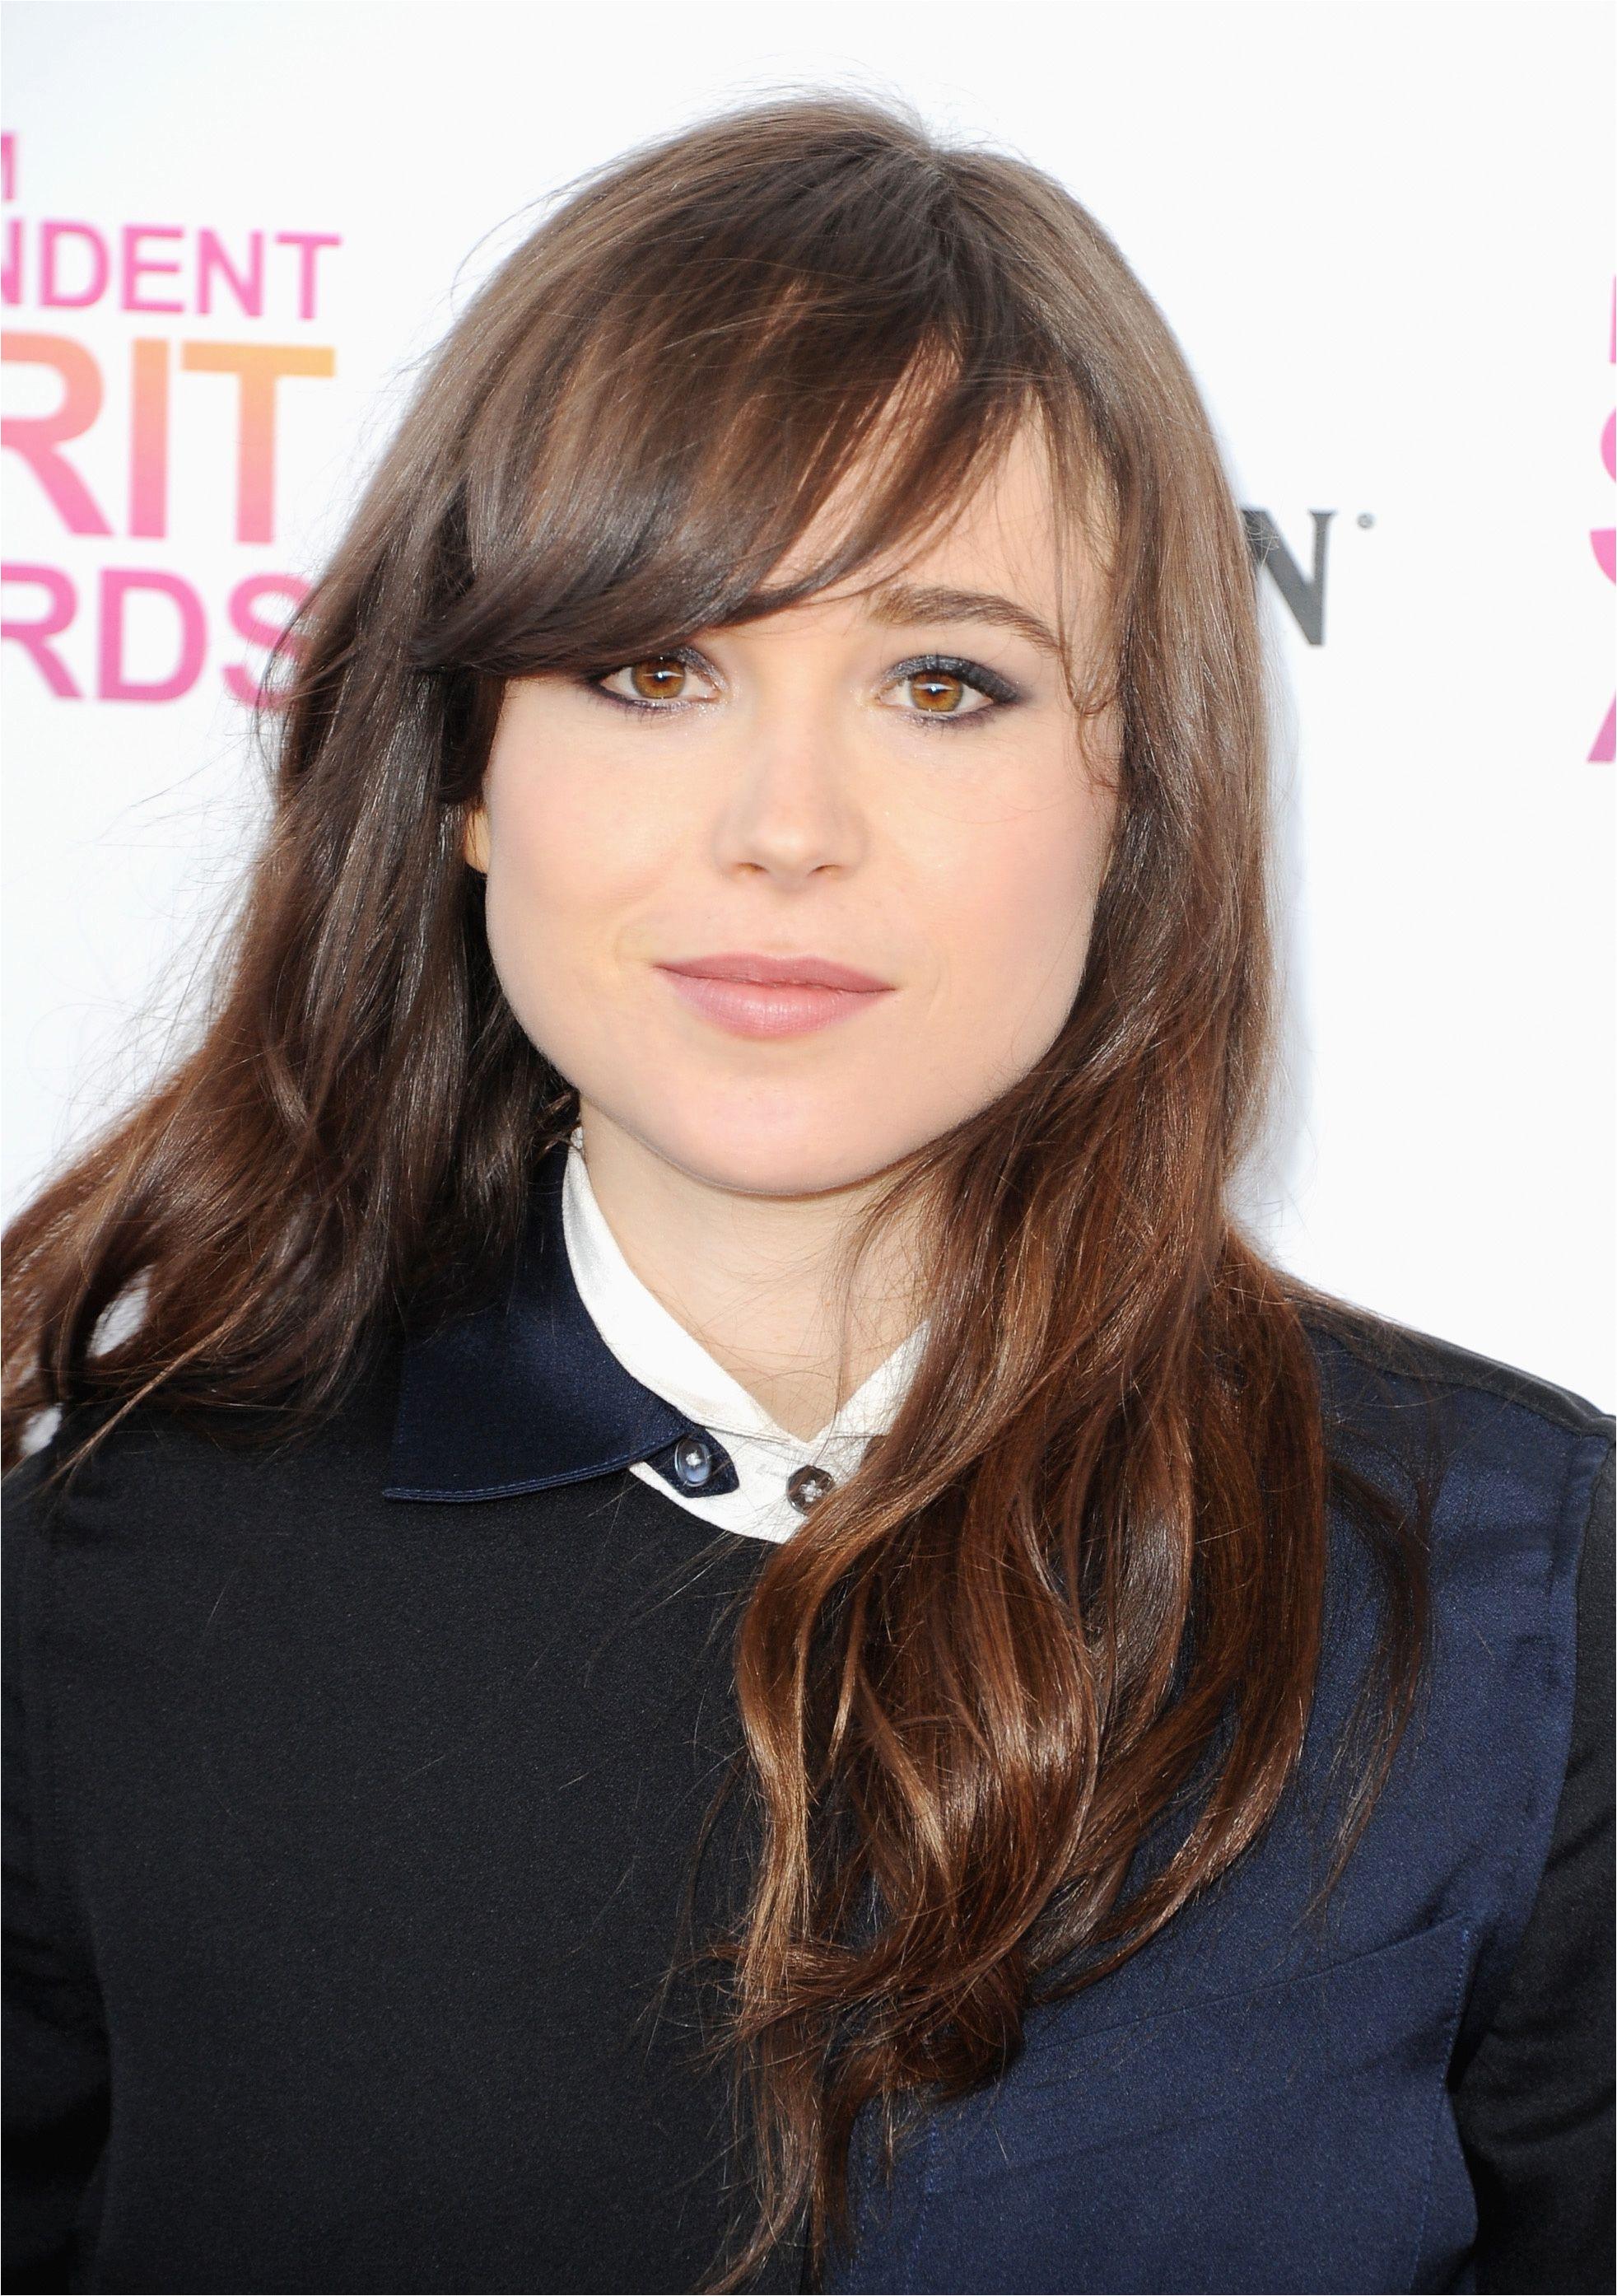 Hairstyle with Bangs Hairstyle with Bangs Forehead Hairstyles Hairstyles For Round Faces